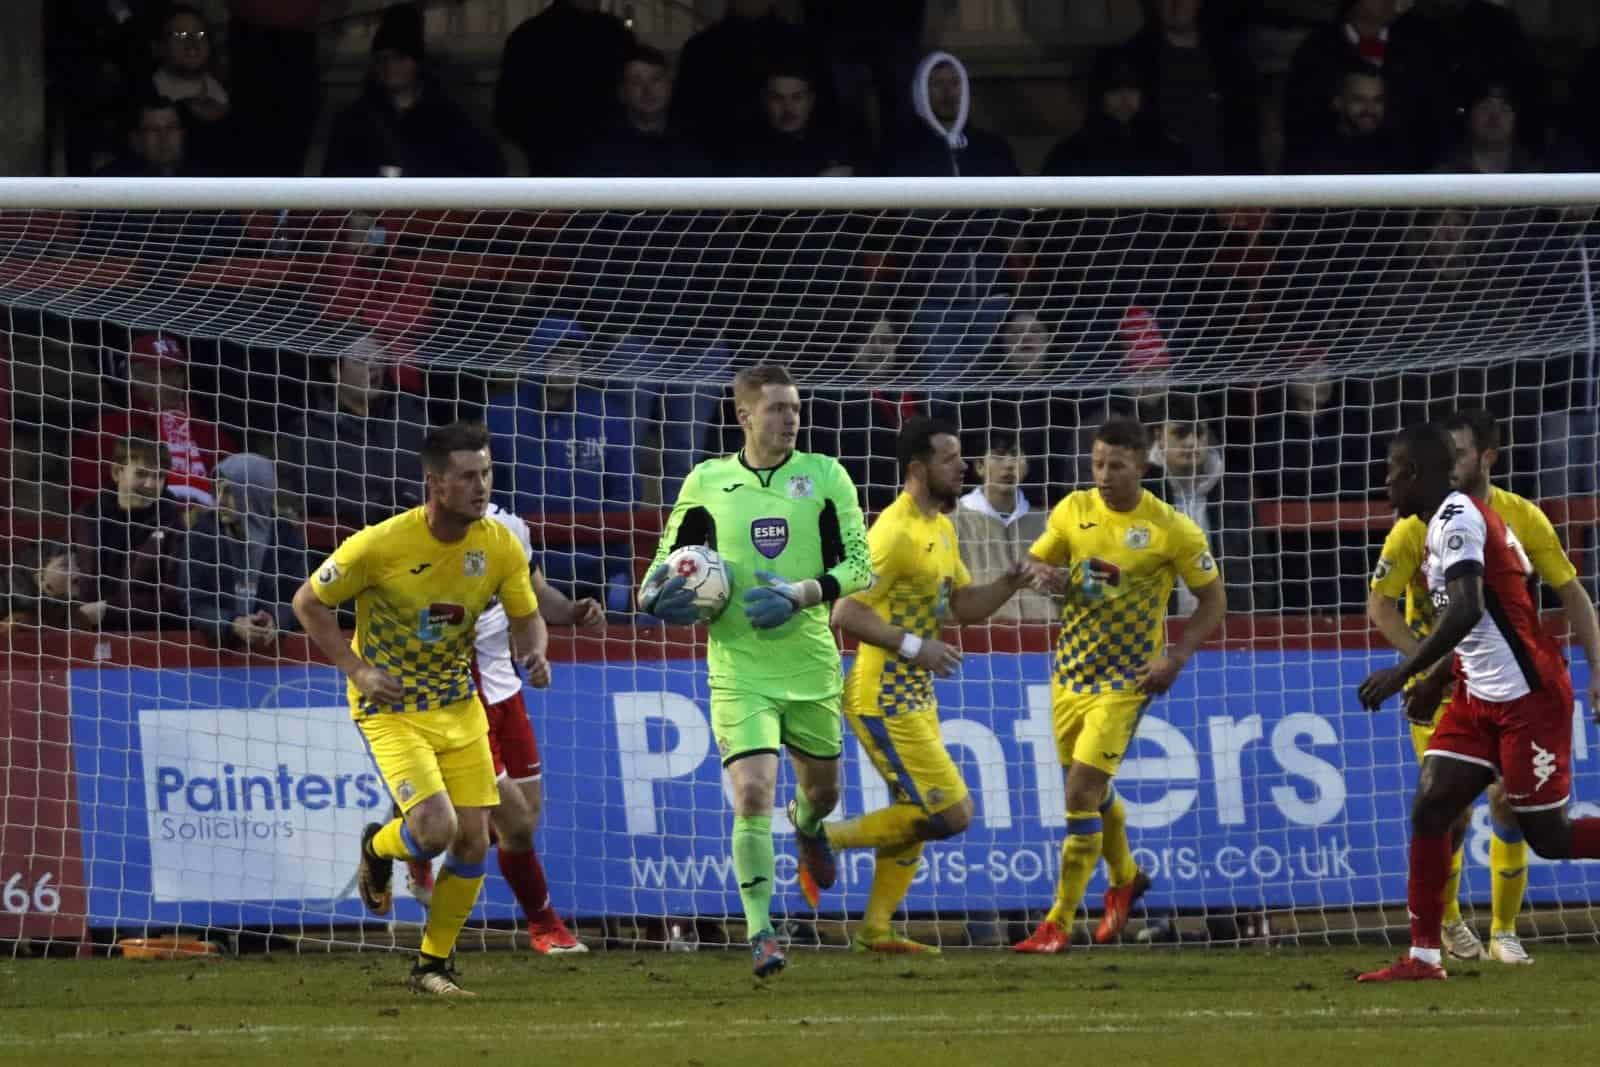 Ian Ormson, Stockport County FC